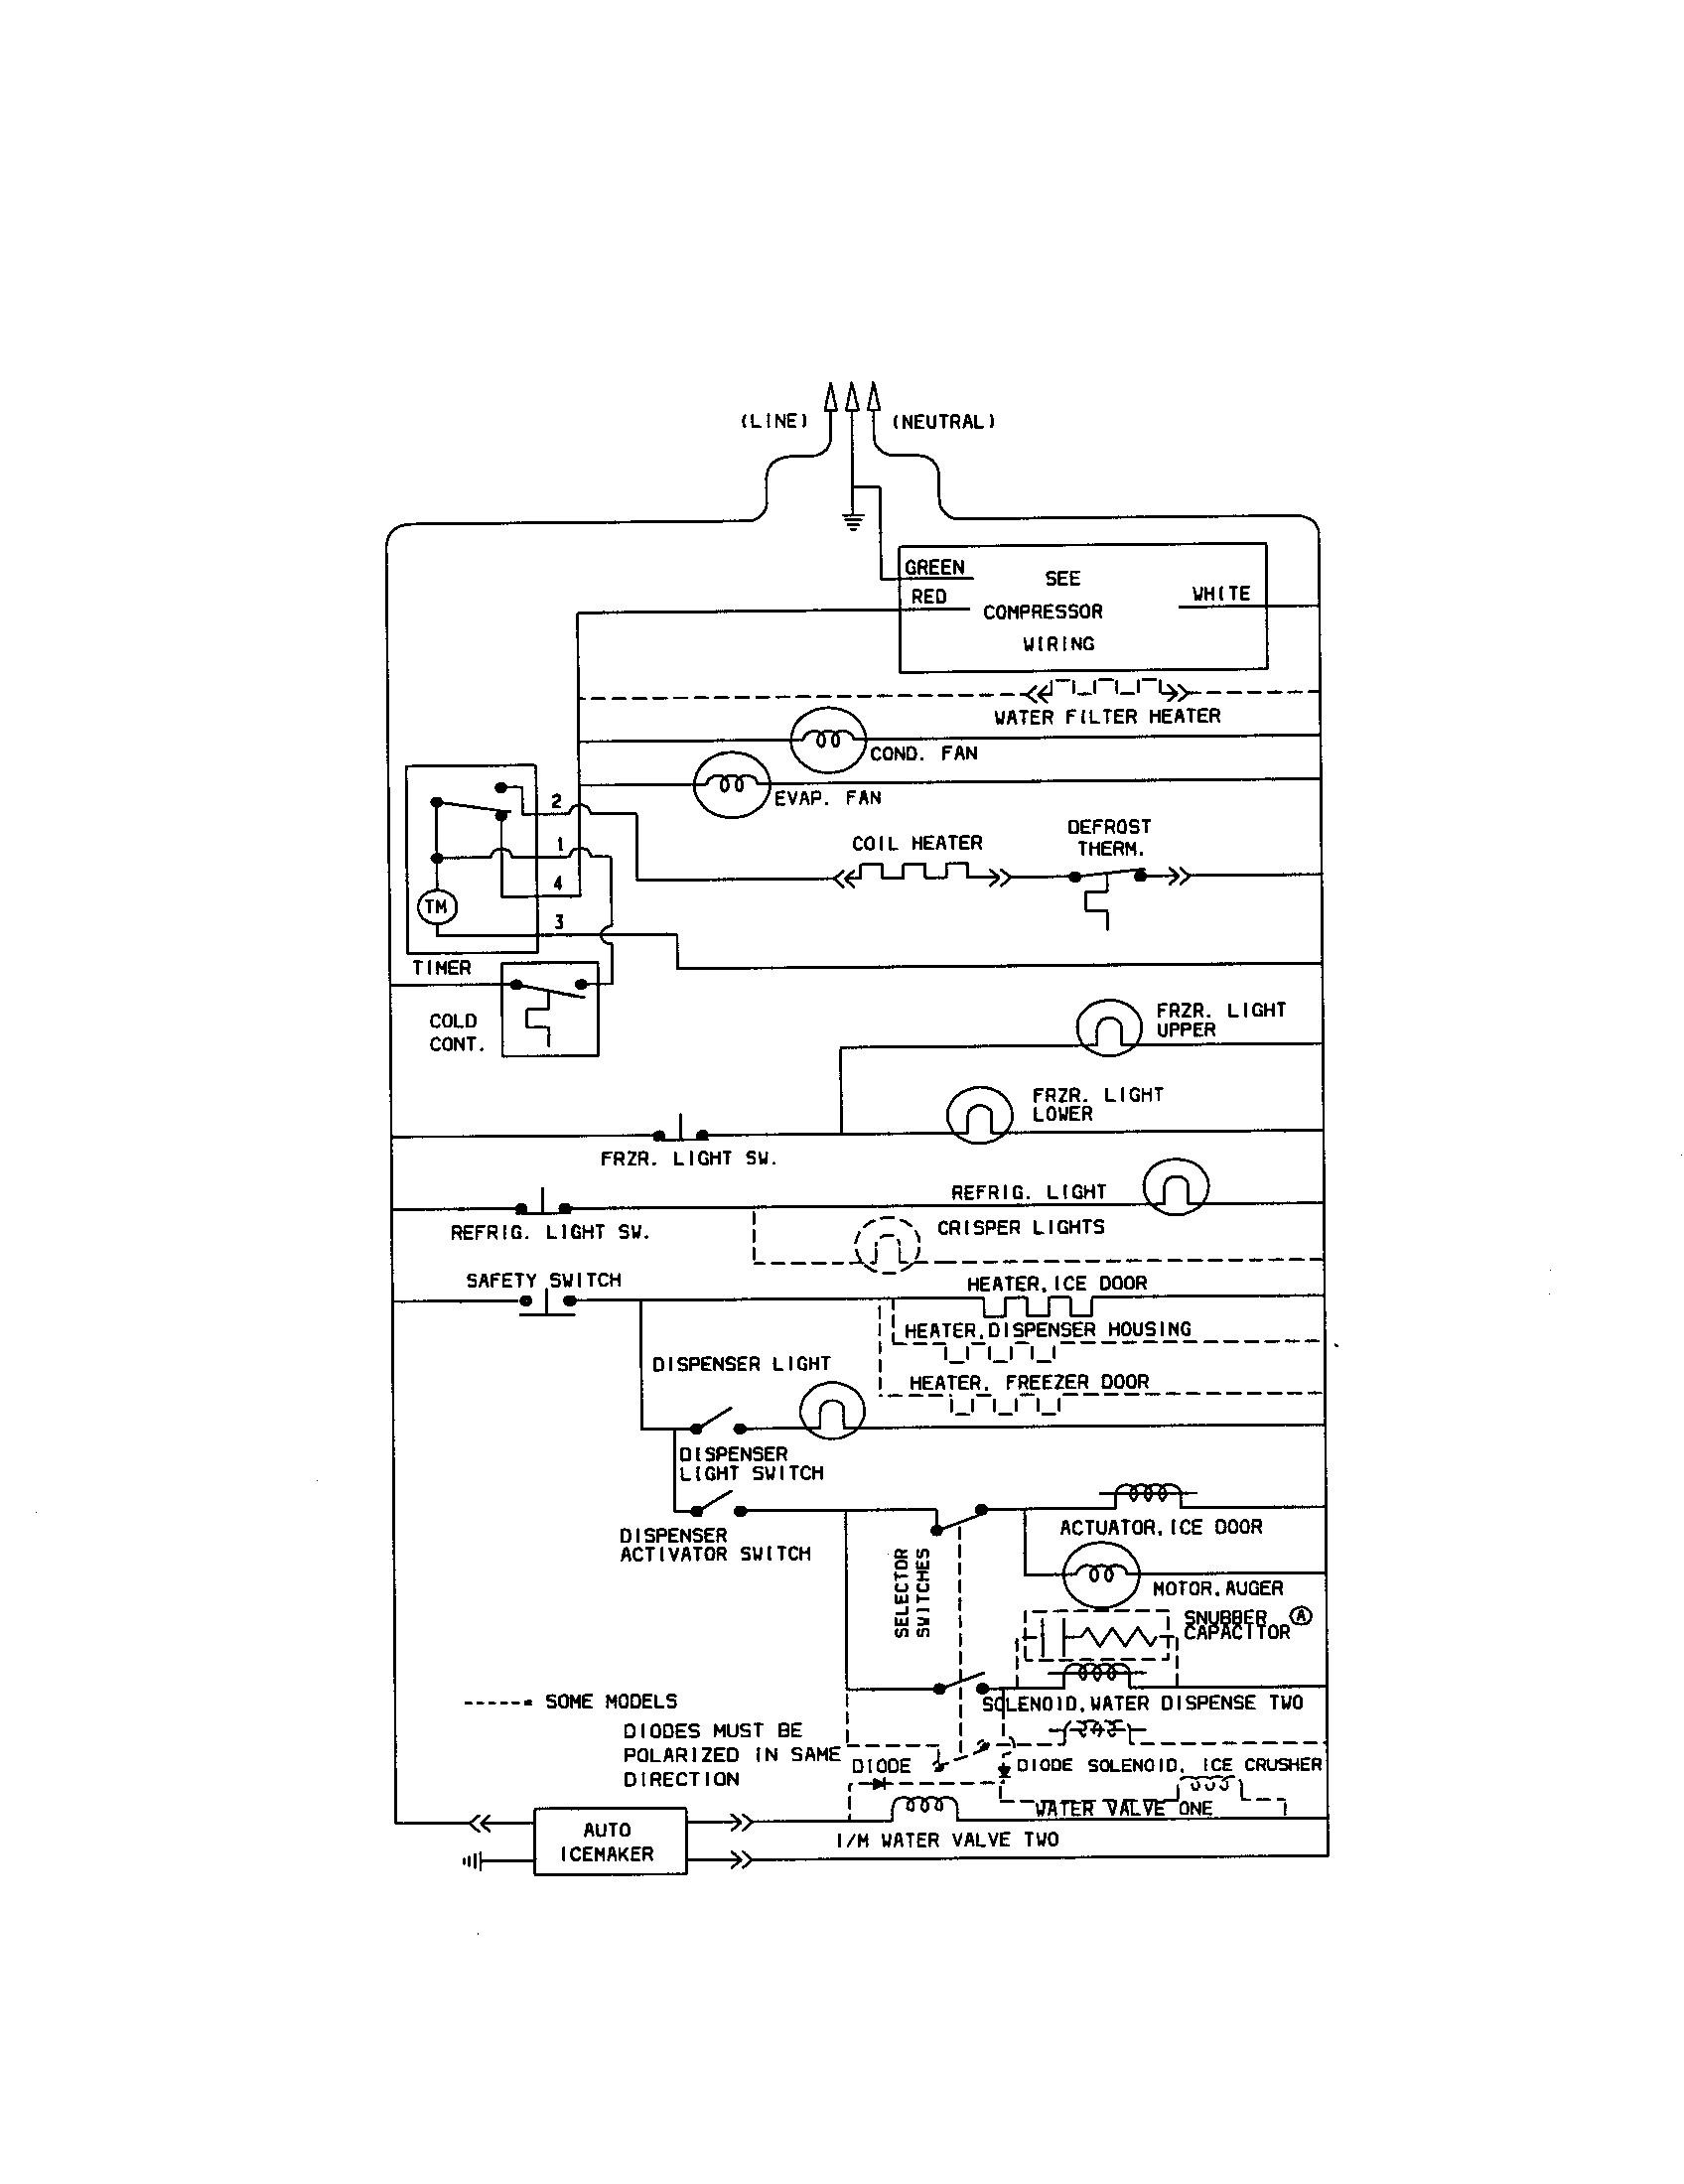 kenmore elite refrigerator electrical diagram